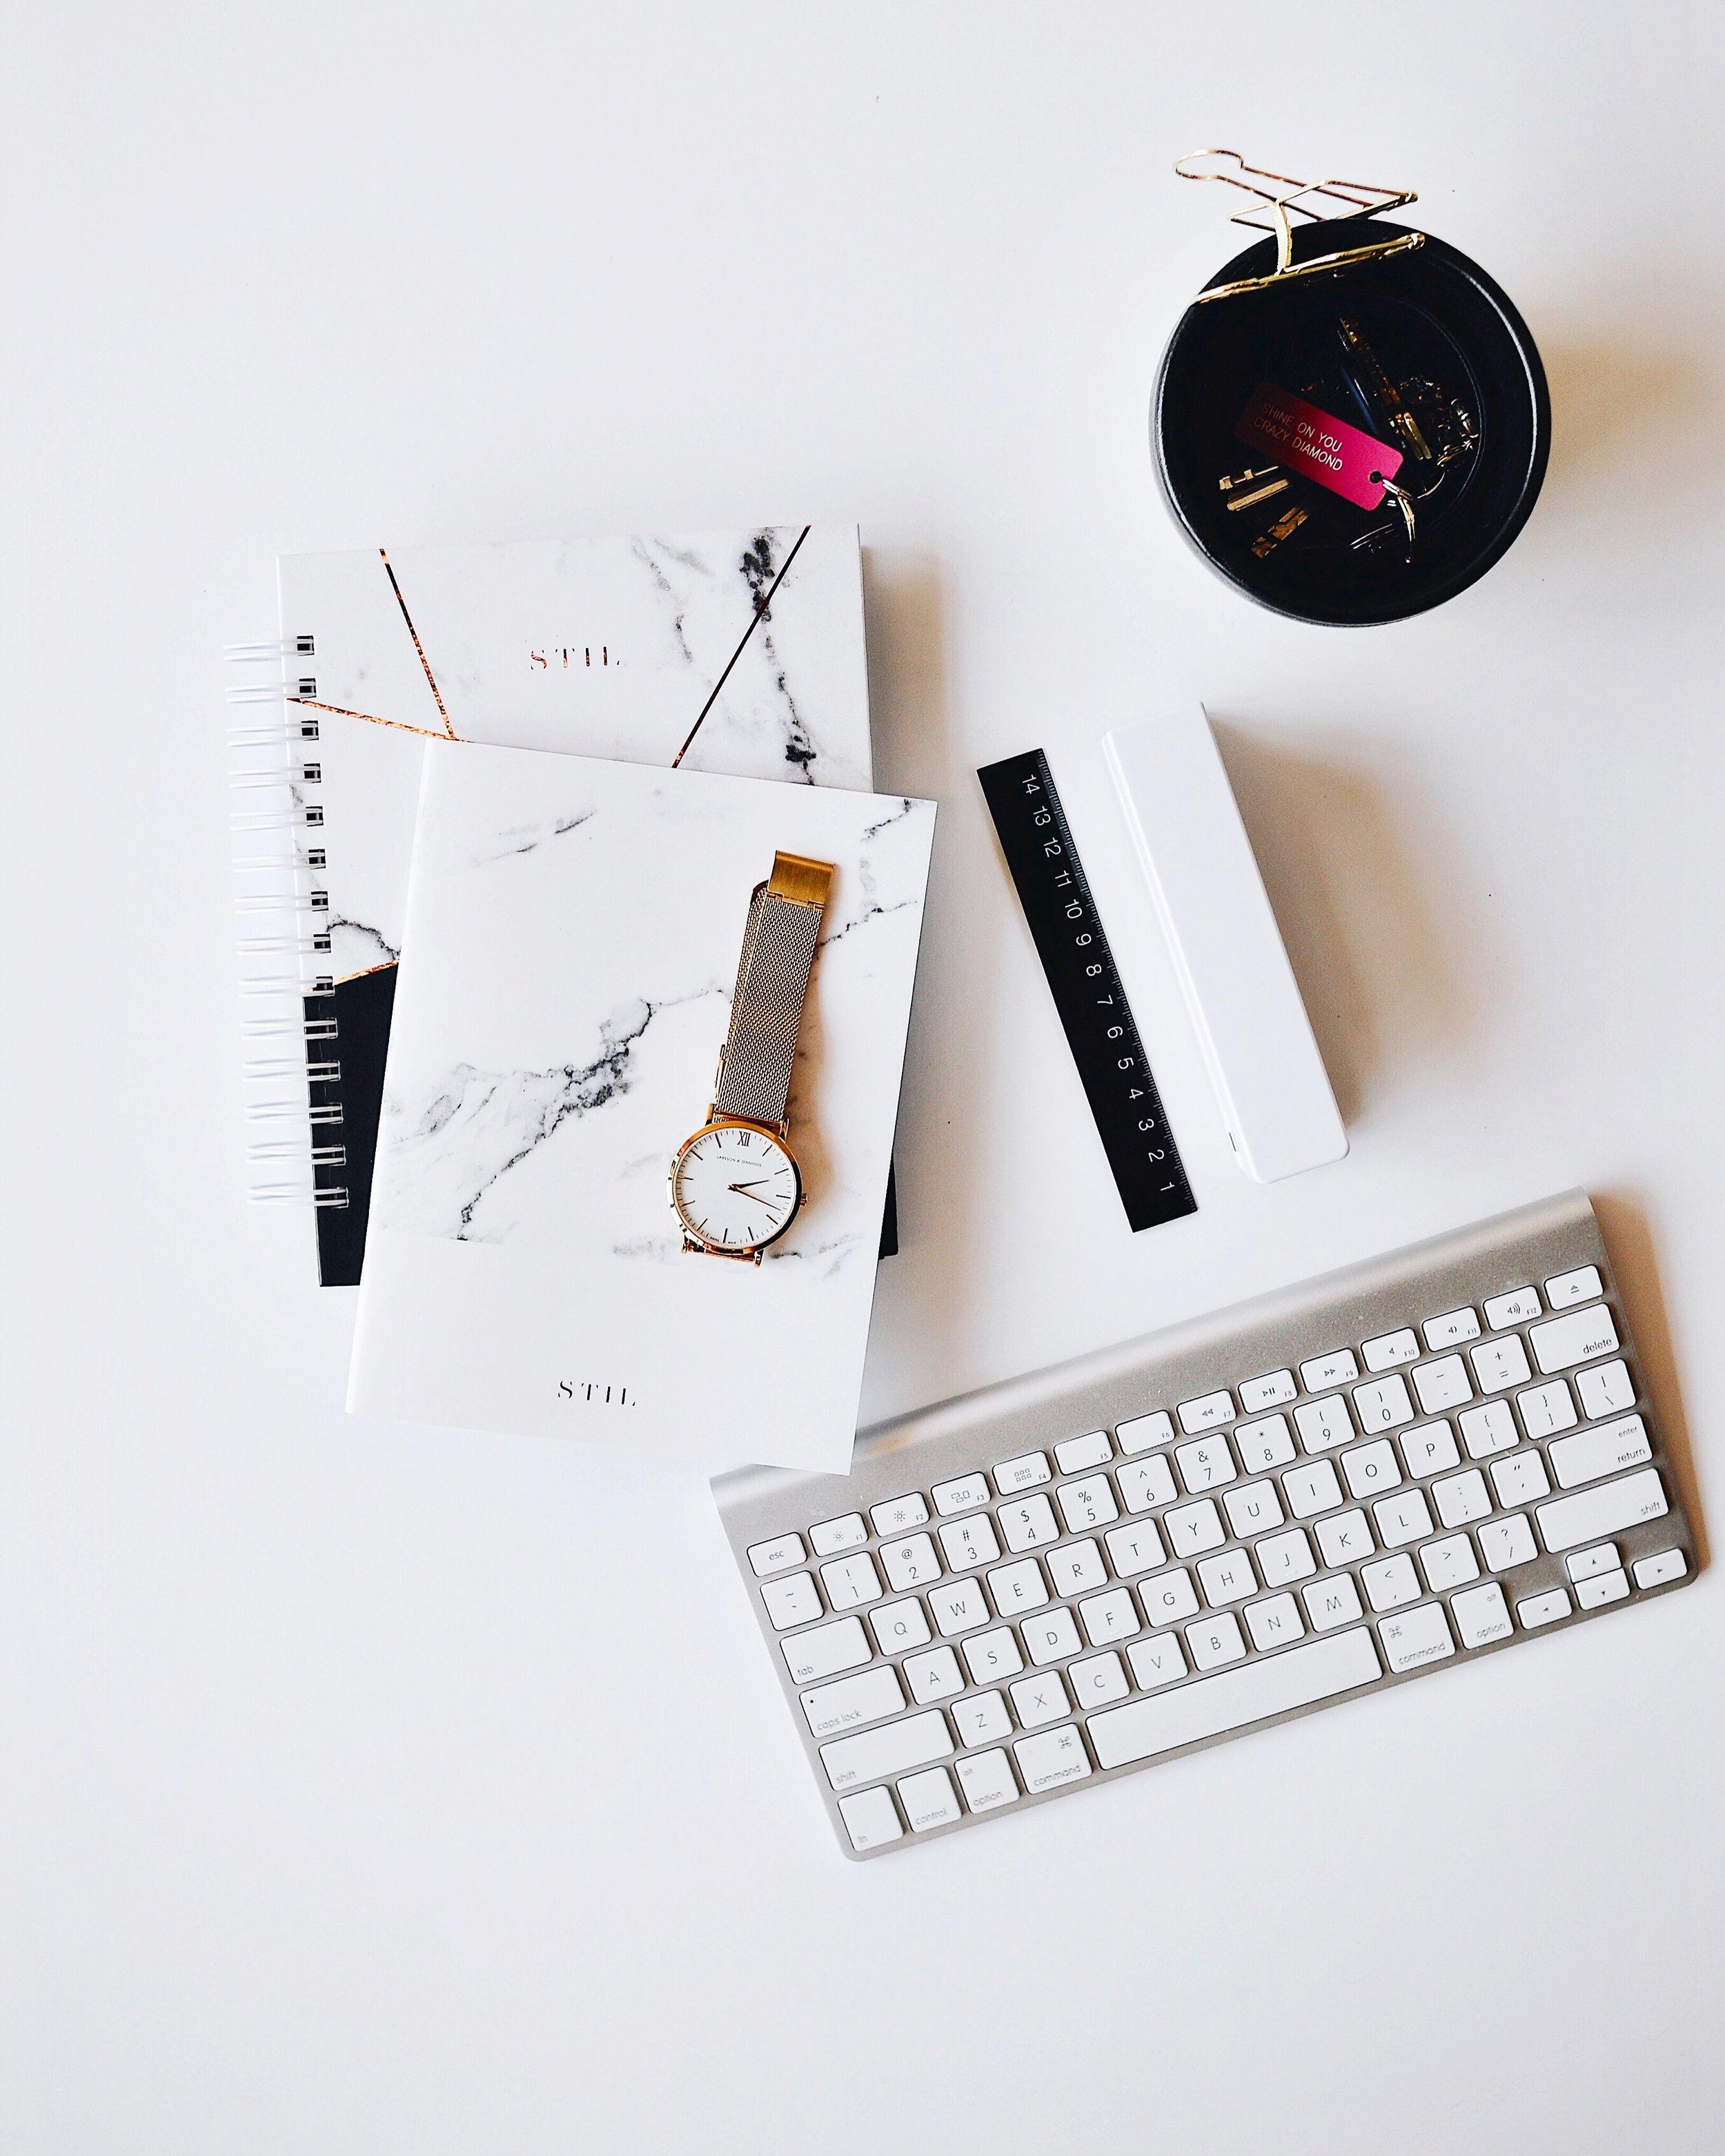 How to stop procrastinating | The Reset wellness retreats for women